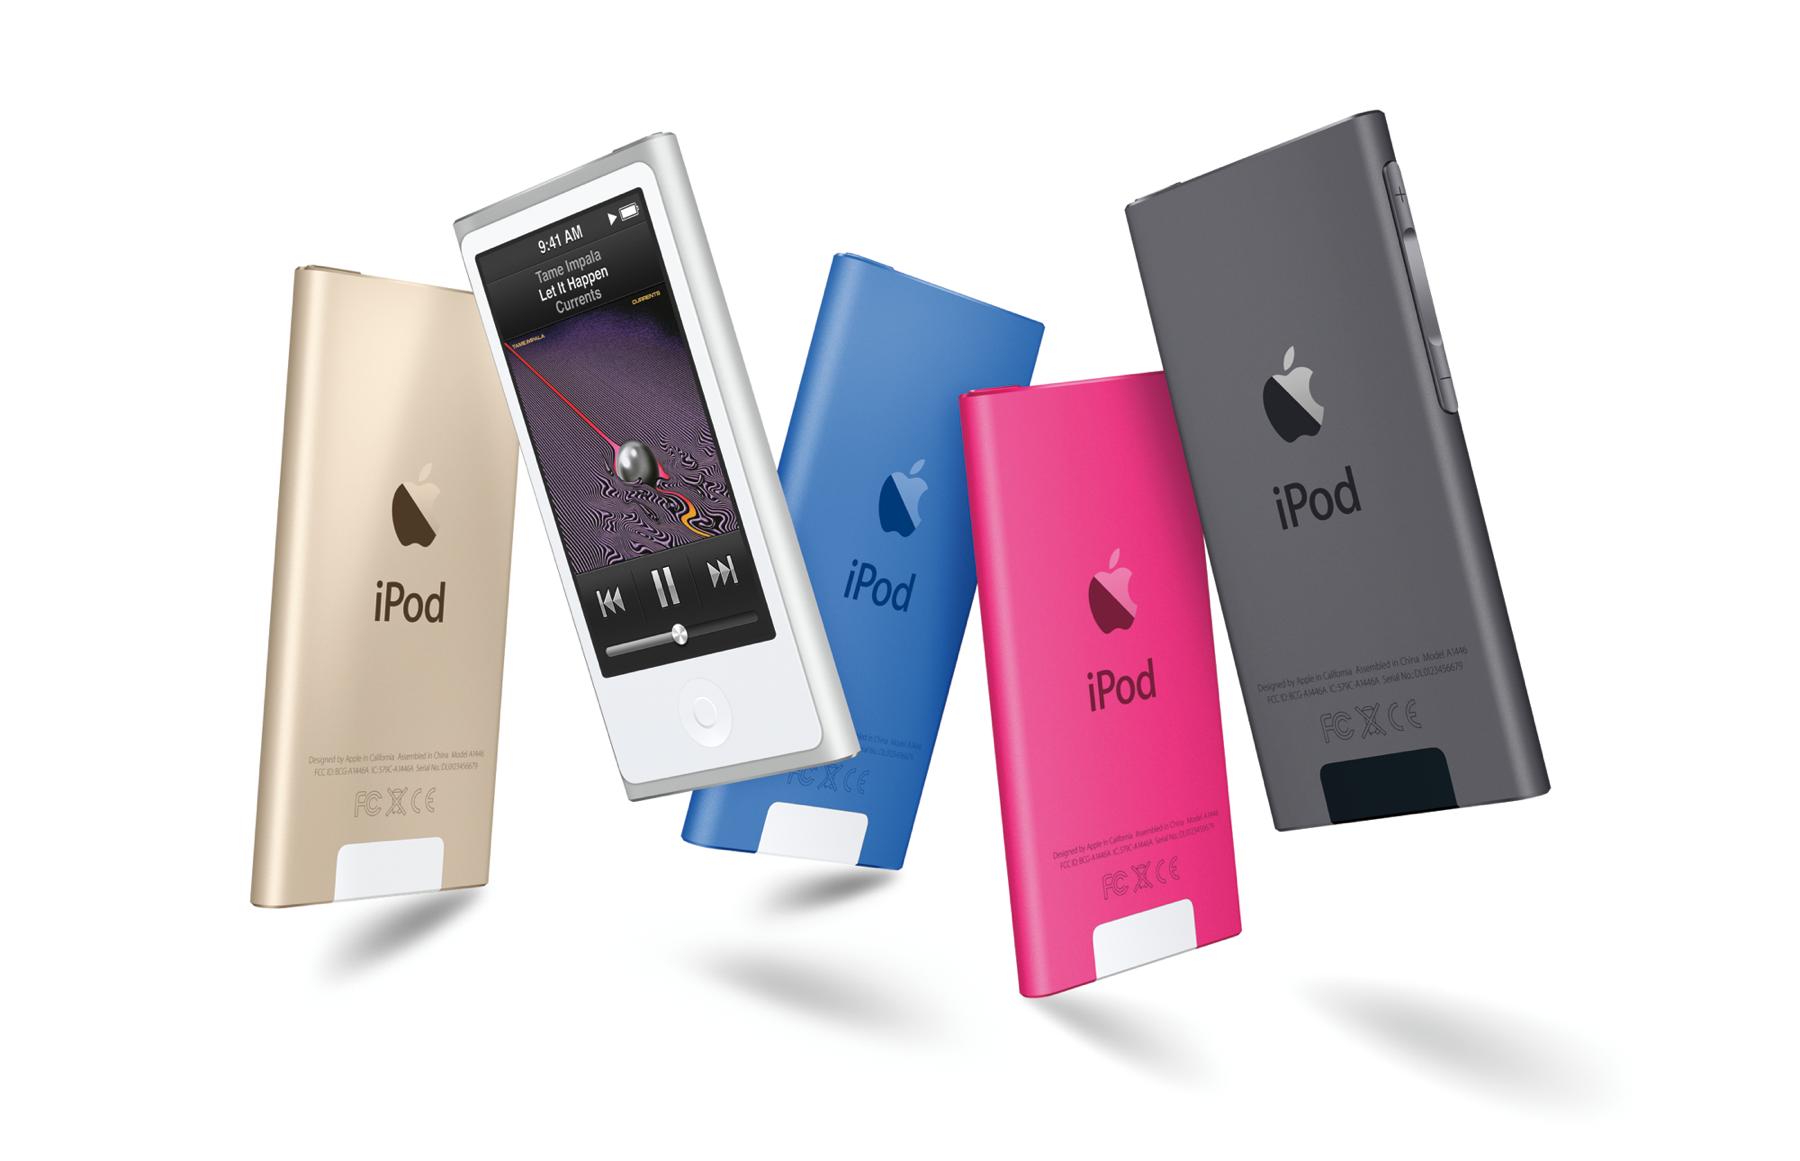 7th-generation iPod nano